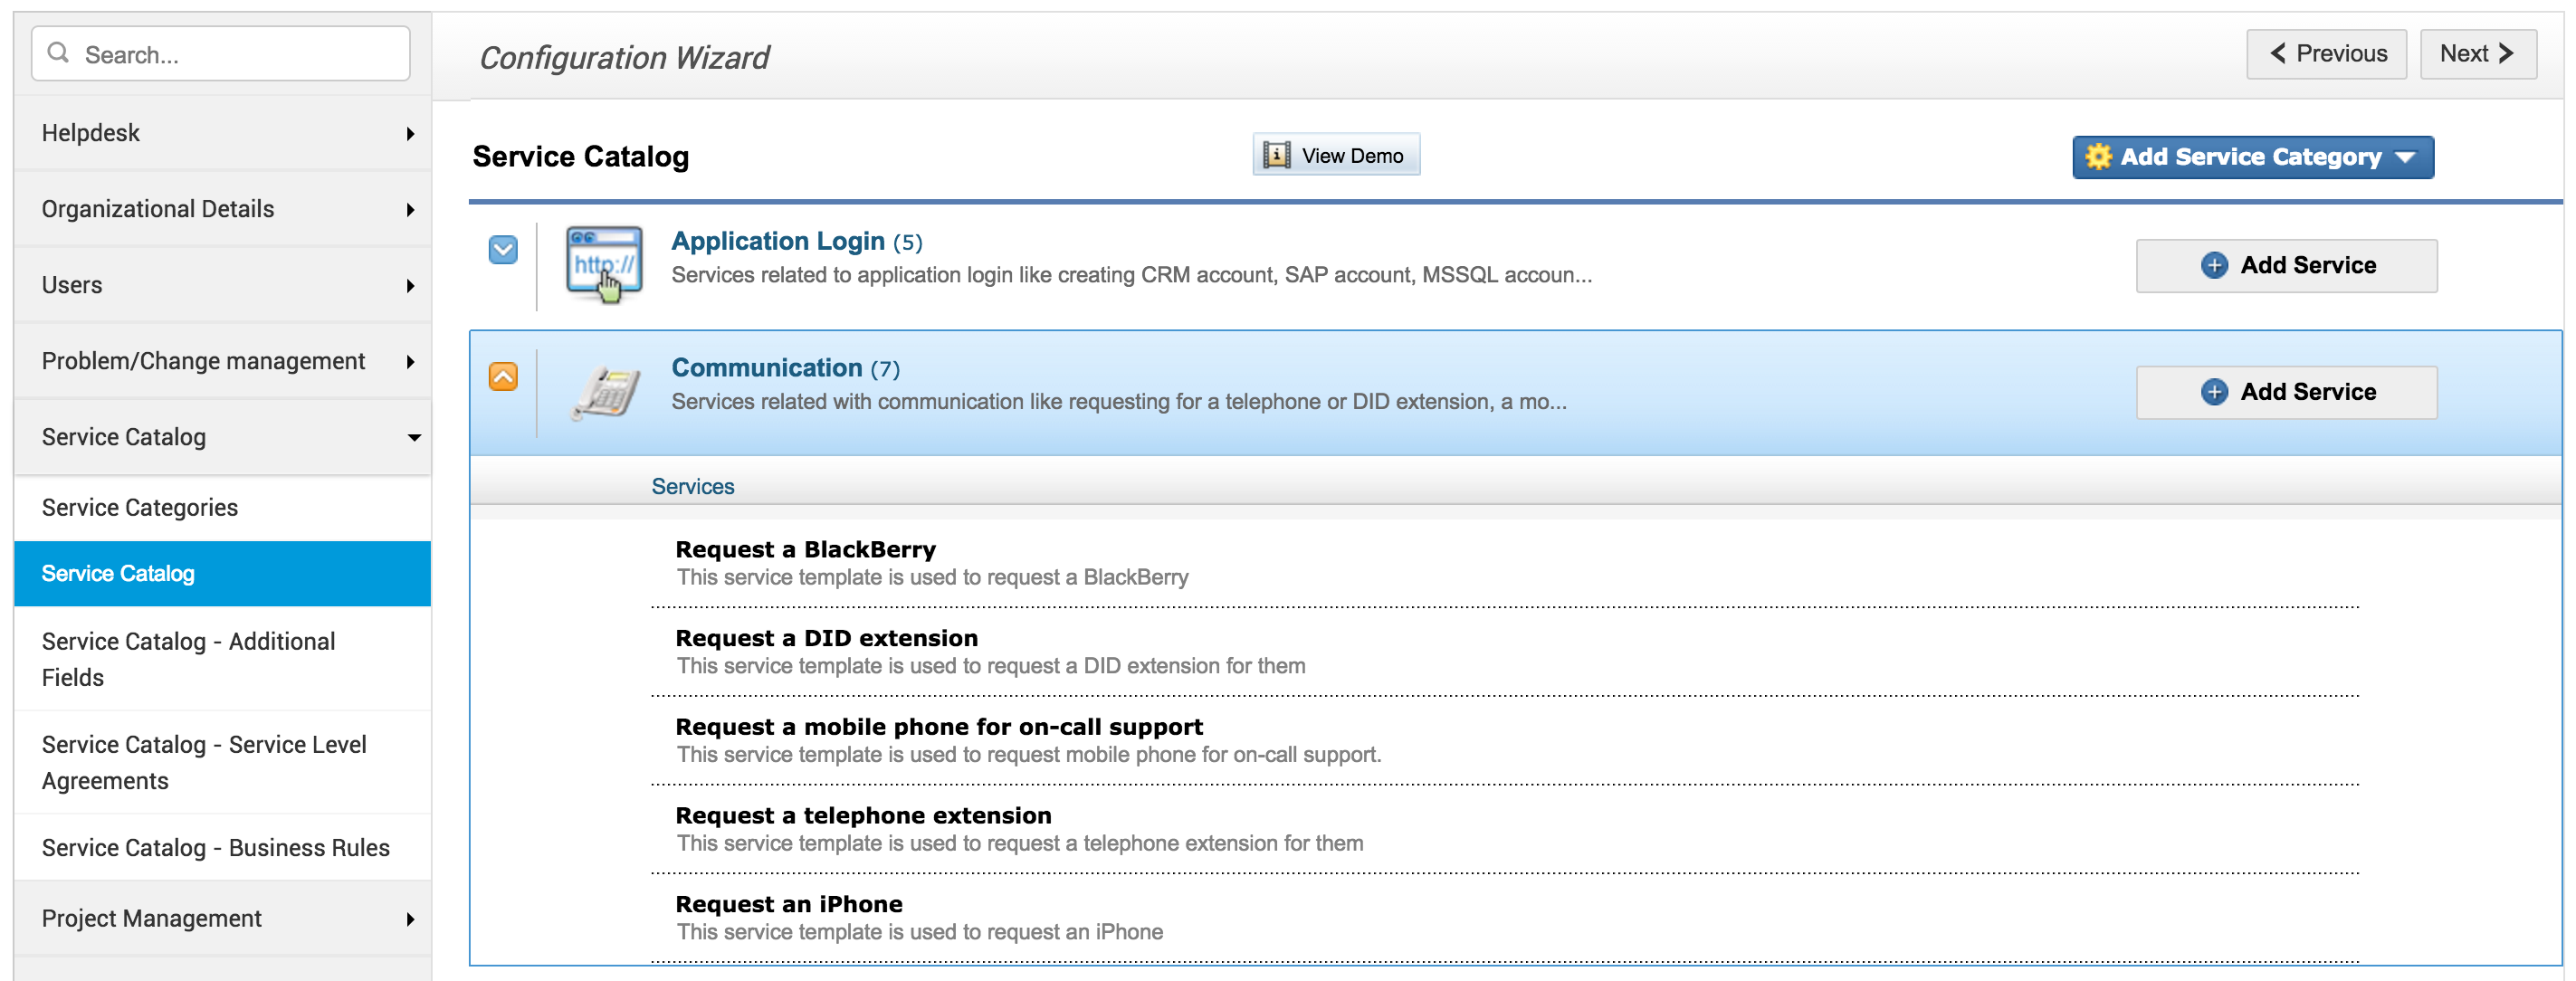 Service Level Agreements Sla Service Catalog Sdp Help Desk Guide